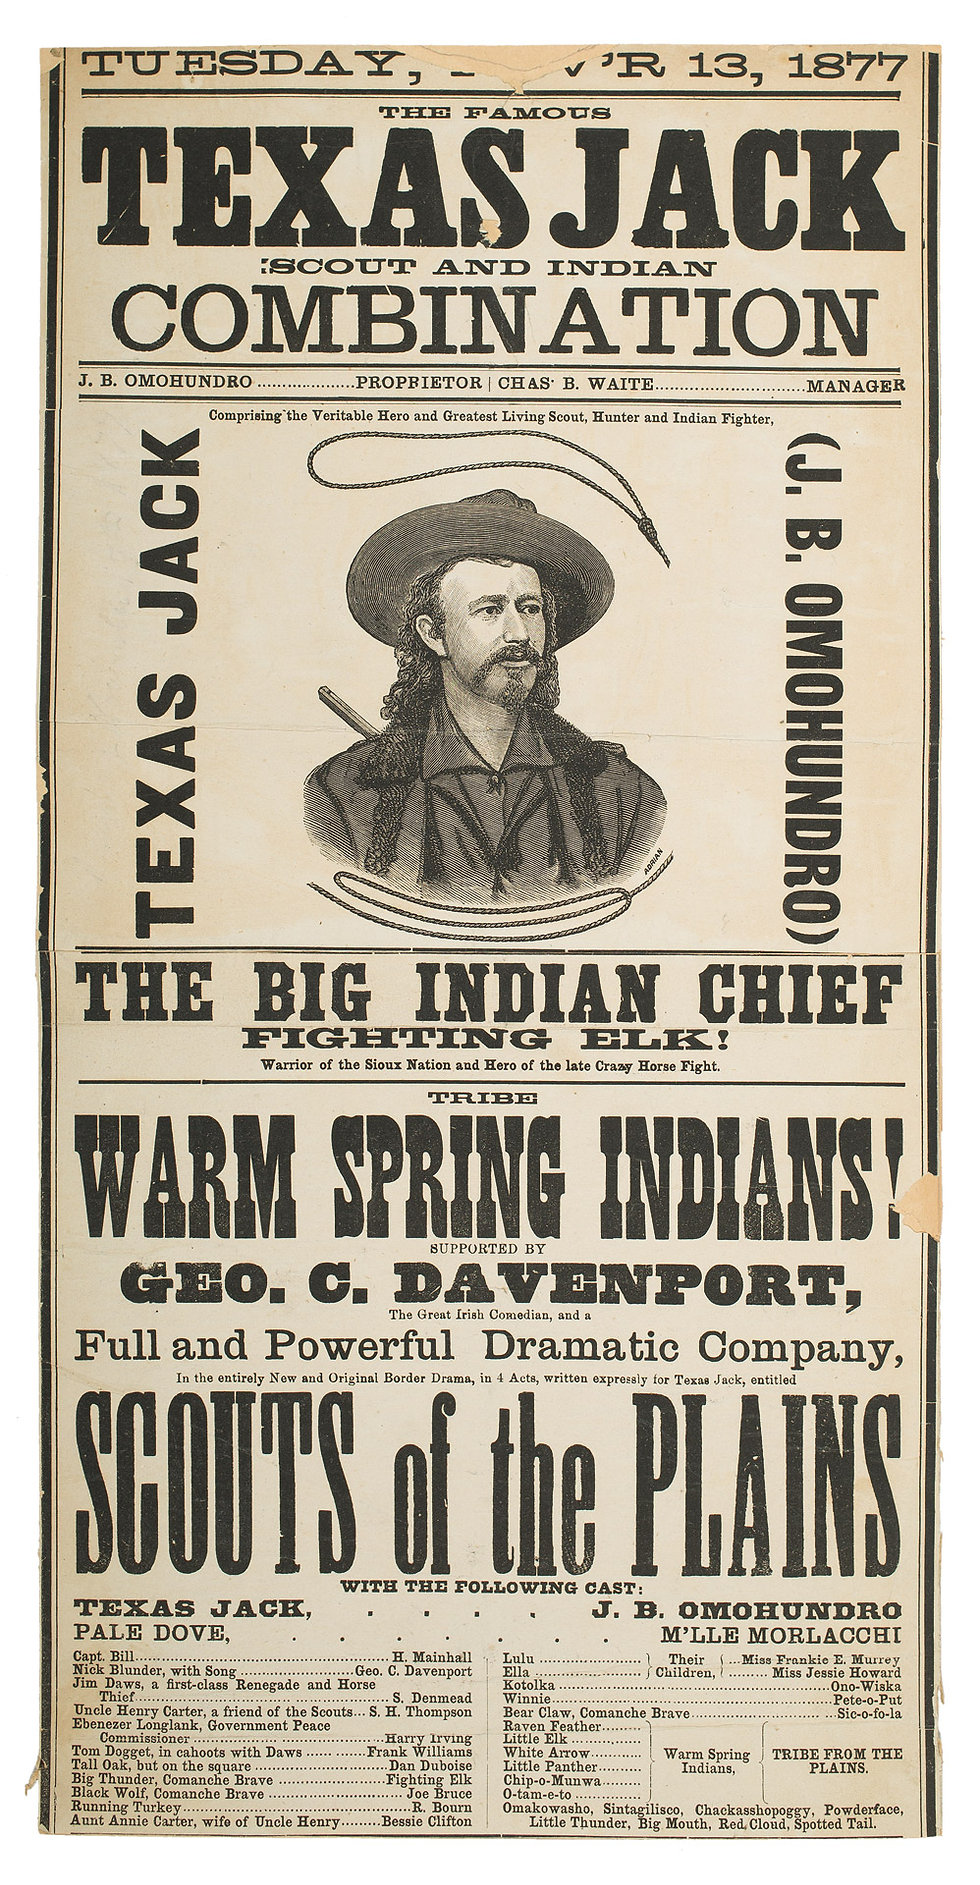 Broadsheet advertisement for the Texas Jack Combination